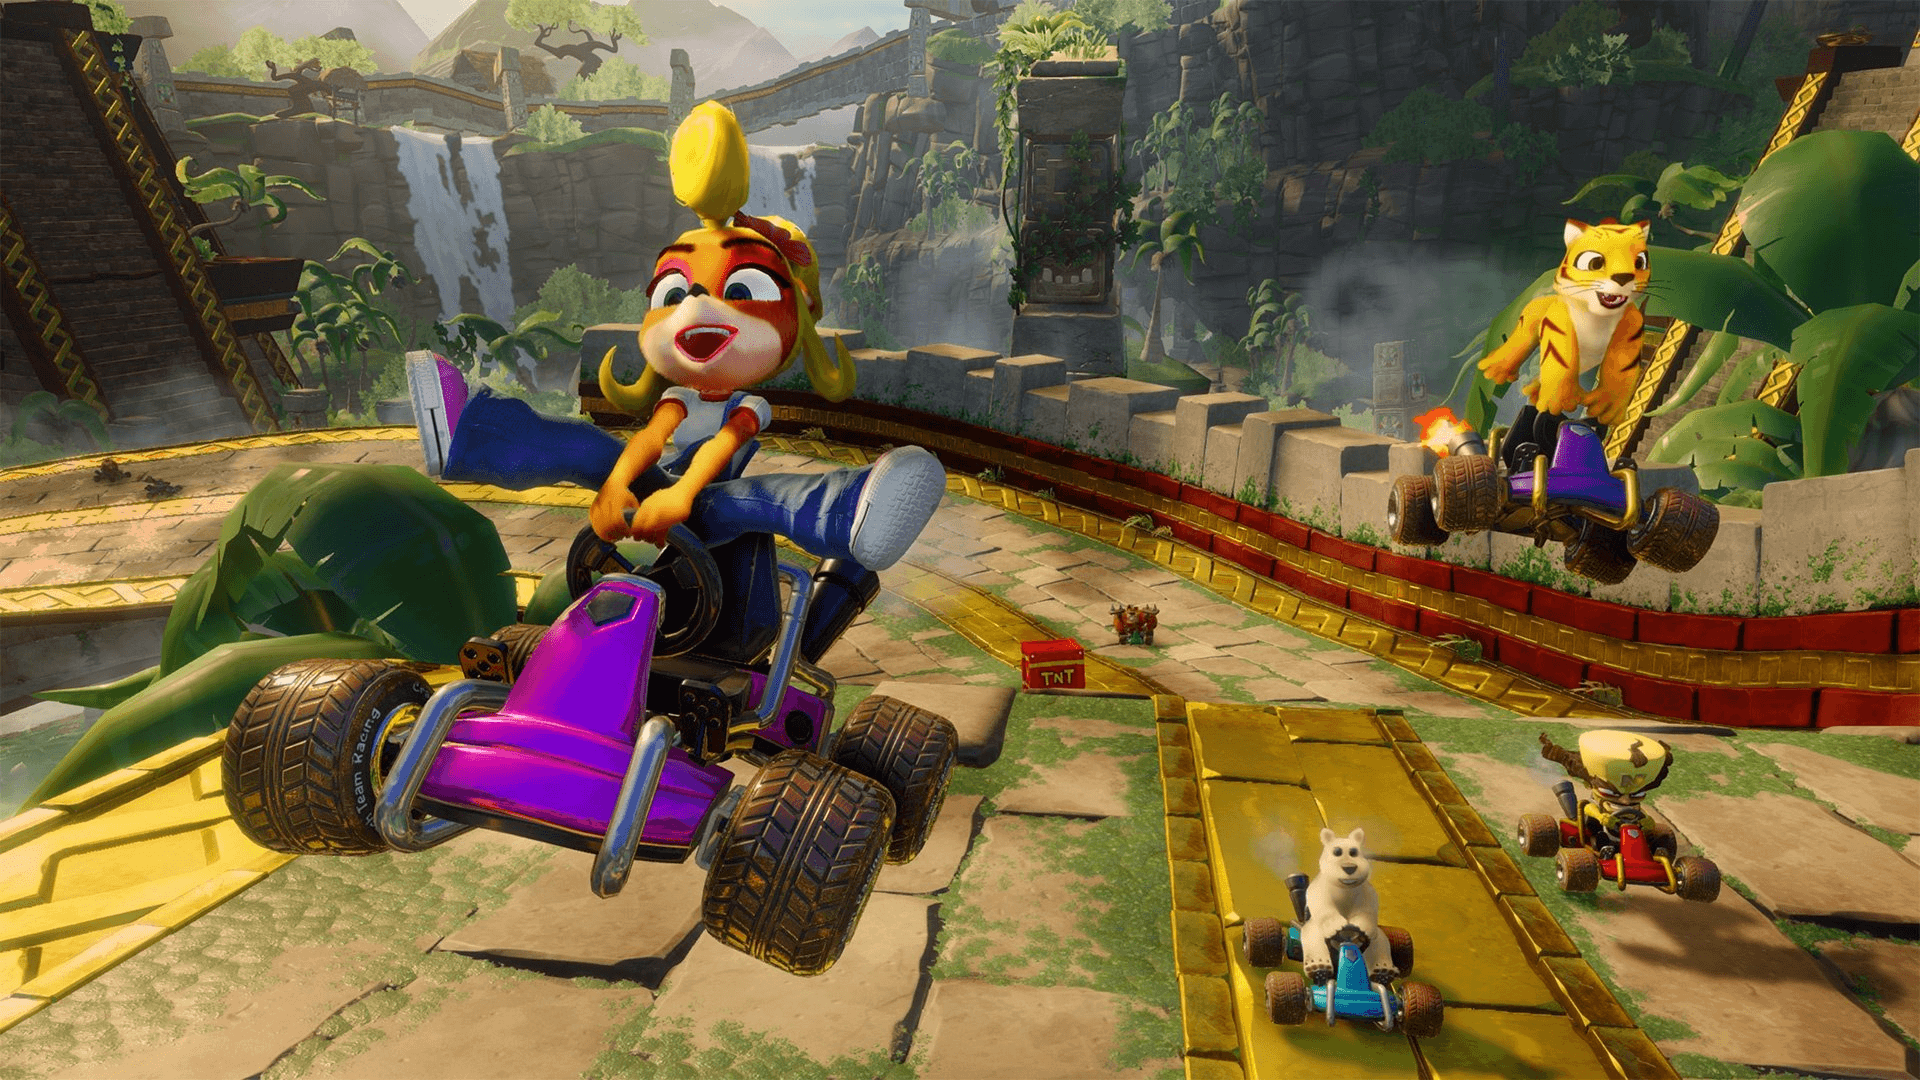 Crash Team Racing characters